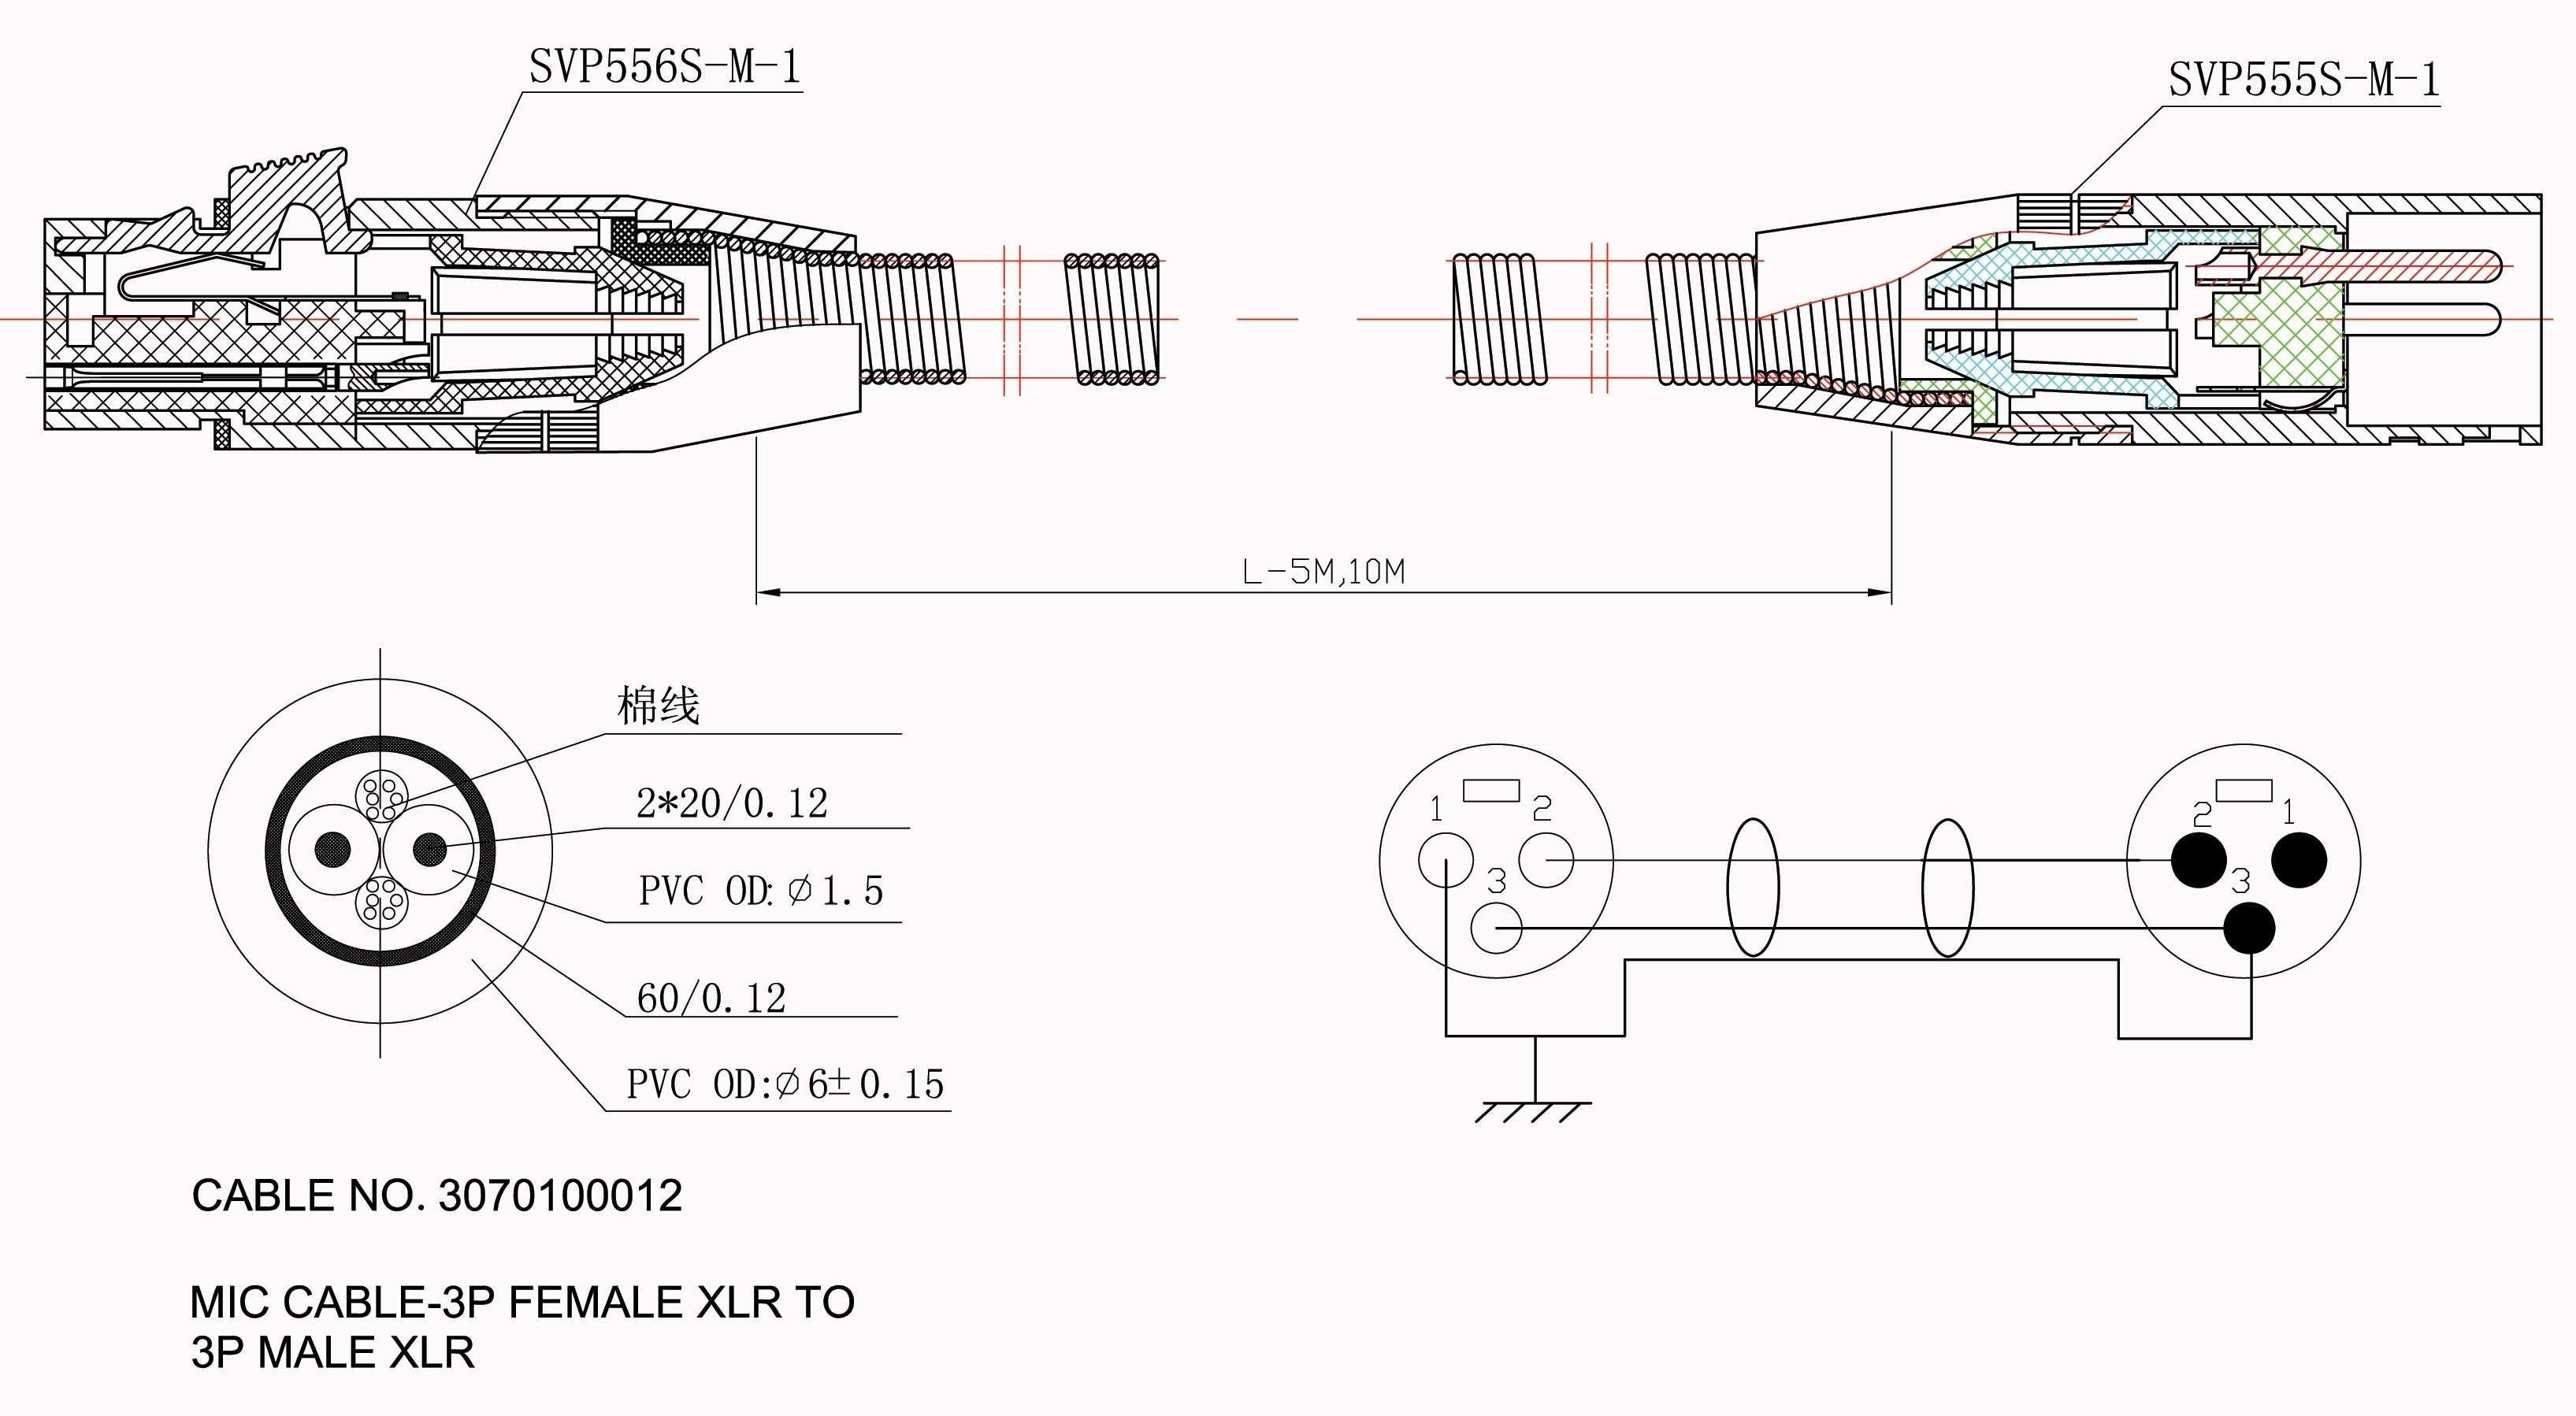 2000 Infiniti I30 Engine Diagram My Wiring Audi A8 Data Schematic U2022 Rh Masterlimobc 2012 2002